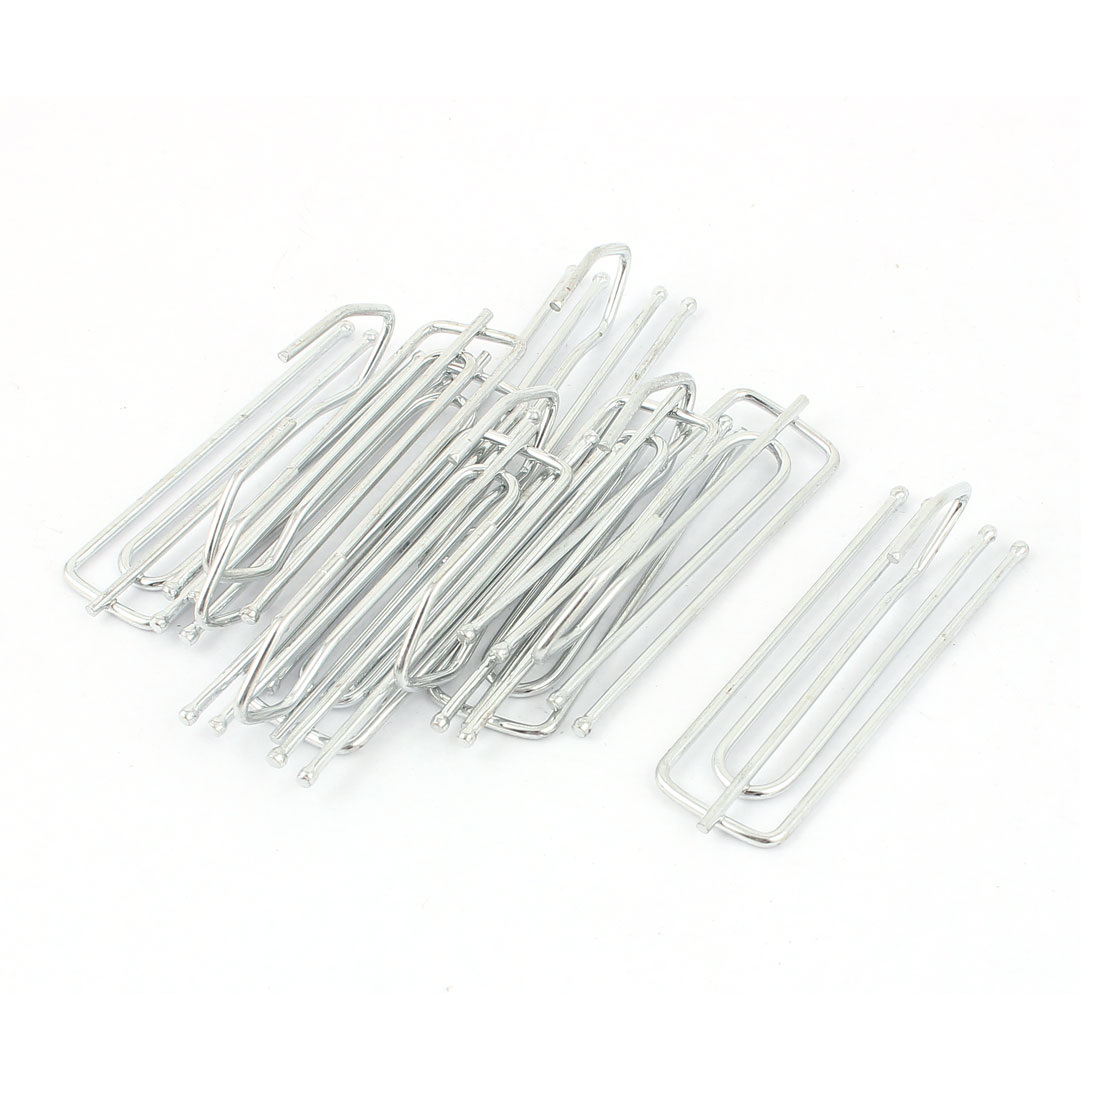 Silver Tone Metal Deep Pinch Prong Window Curtain Pleat Hooks Pleater 10pcs